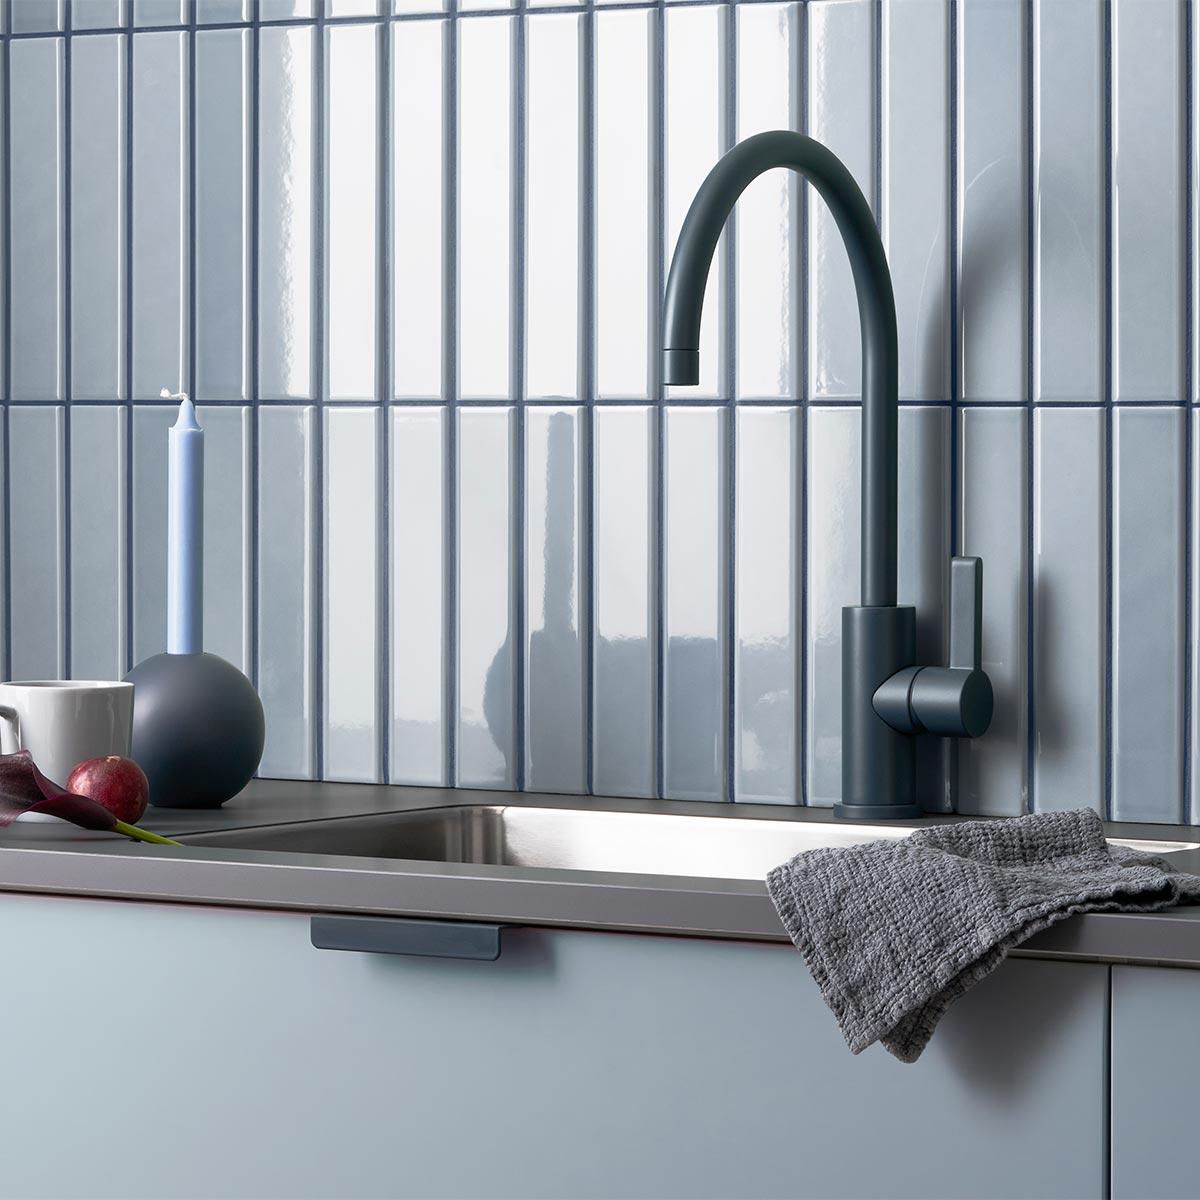 0044 Toniton 03G 398 Blue grey laminate edge 120 handle original 506156 1200x1200px